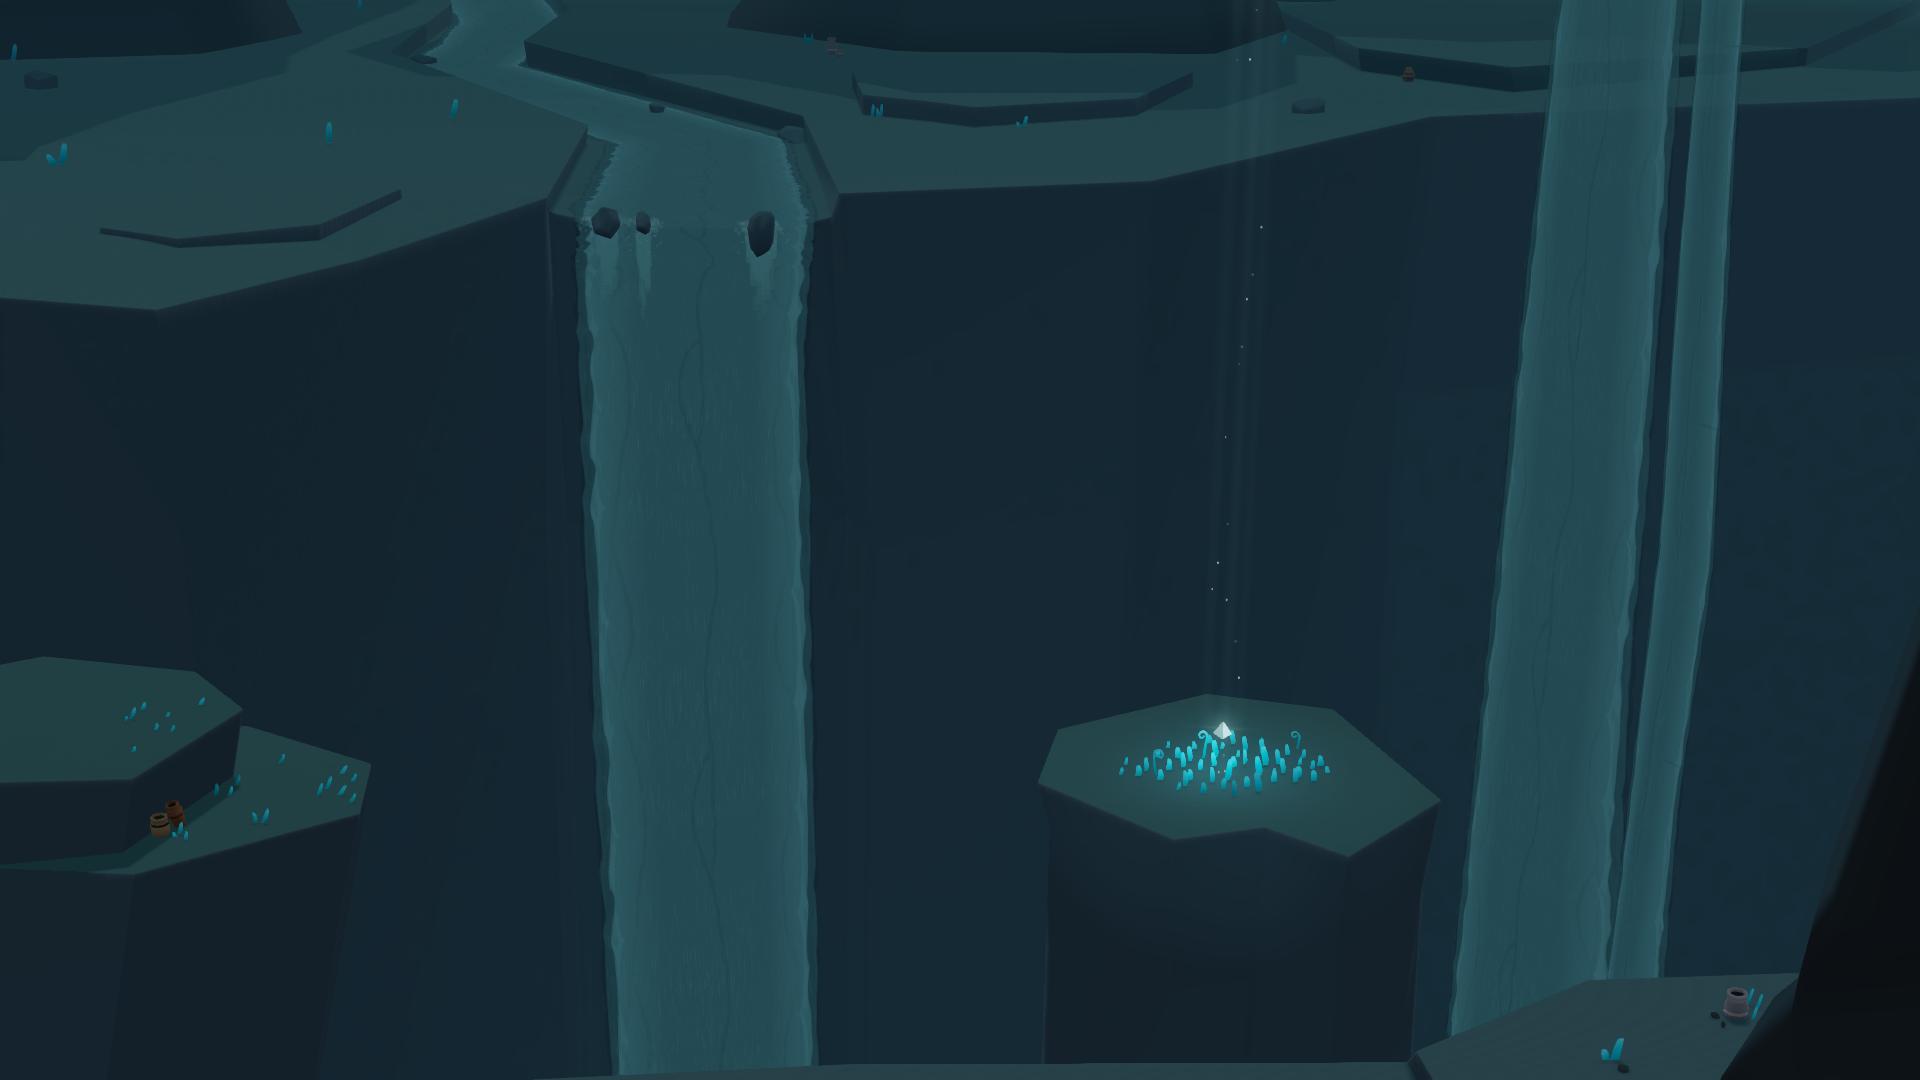 Distant screenshot 003